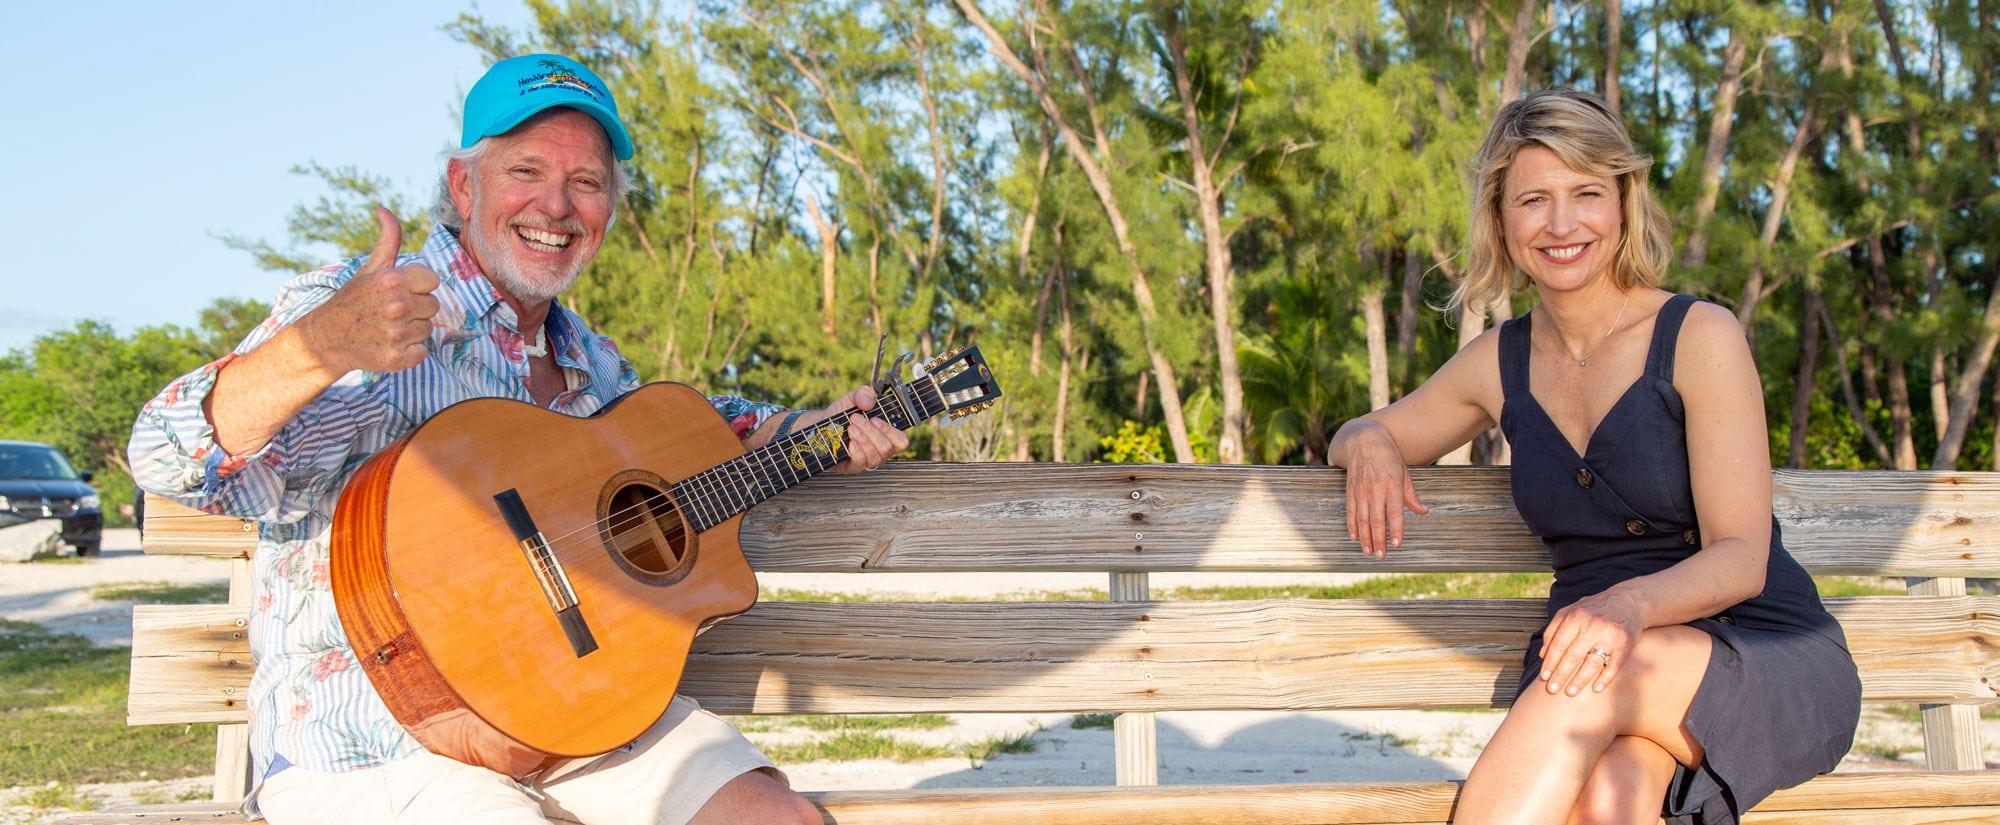 Fort Zachary Beach - Key West - Samantha Brown